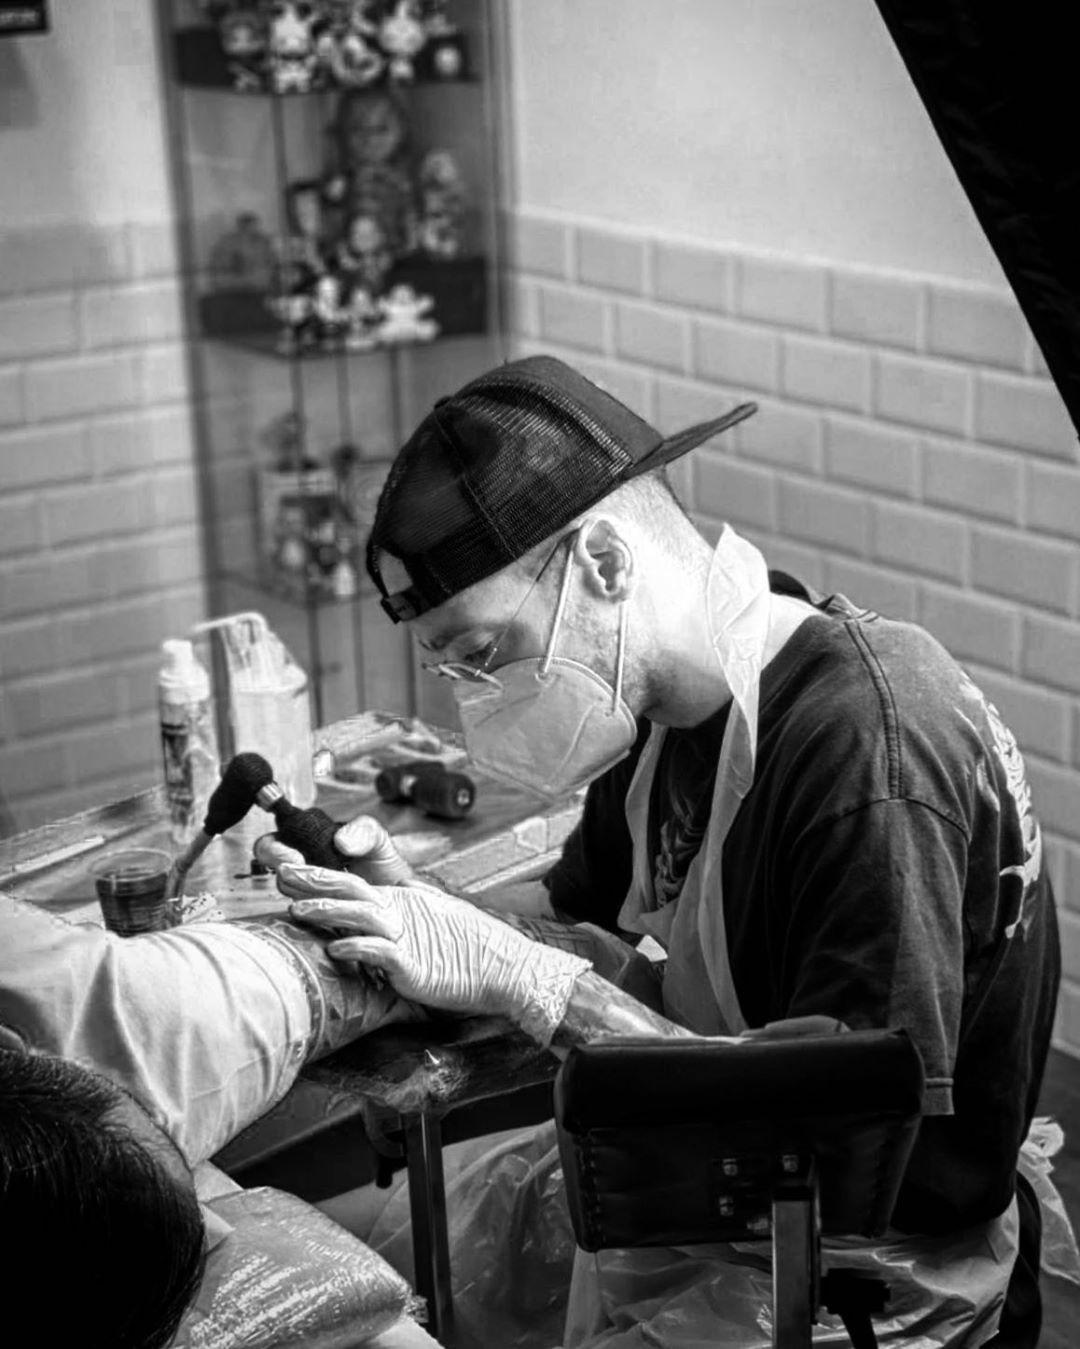 ⚒working⚒ Para consultas👉🏻 @owen_martin89 #tattoo #tattoos #tattoospain #tattoocollector #tattoocollection #tattooforlife #tatuaje #tatts #tattooart #thebestspaintattooartists #superbtattoos #realistictattoo #realismo #realismtattoo #bng #blackandgreytattoo #ink #inkforlife #inkedup #inkaddict #inkedmag #inkedlife #inklife #working  @darumatattoos